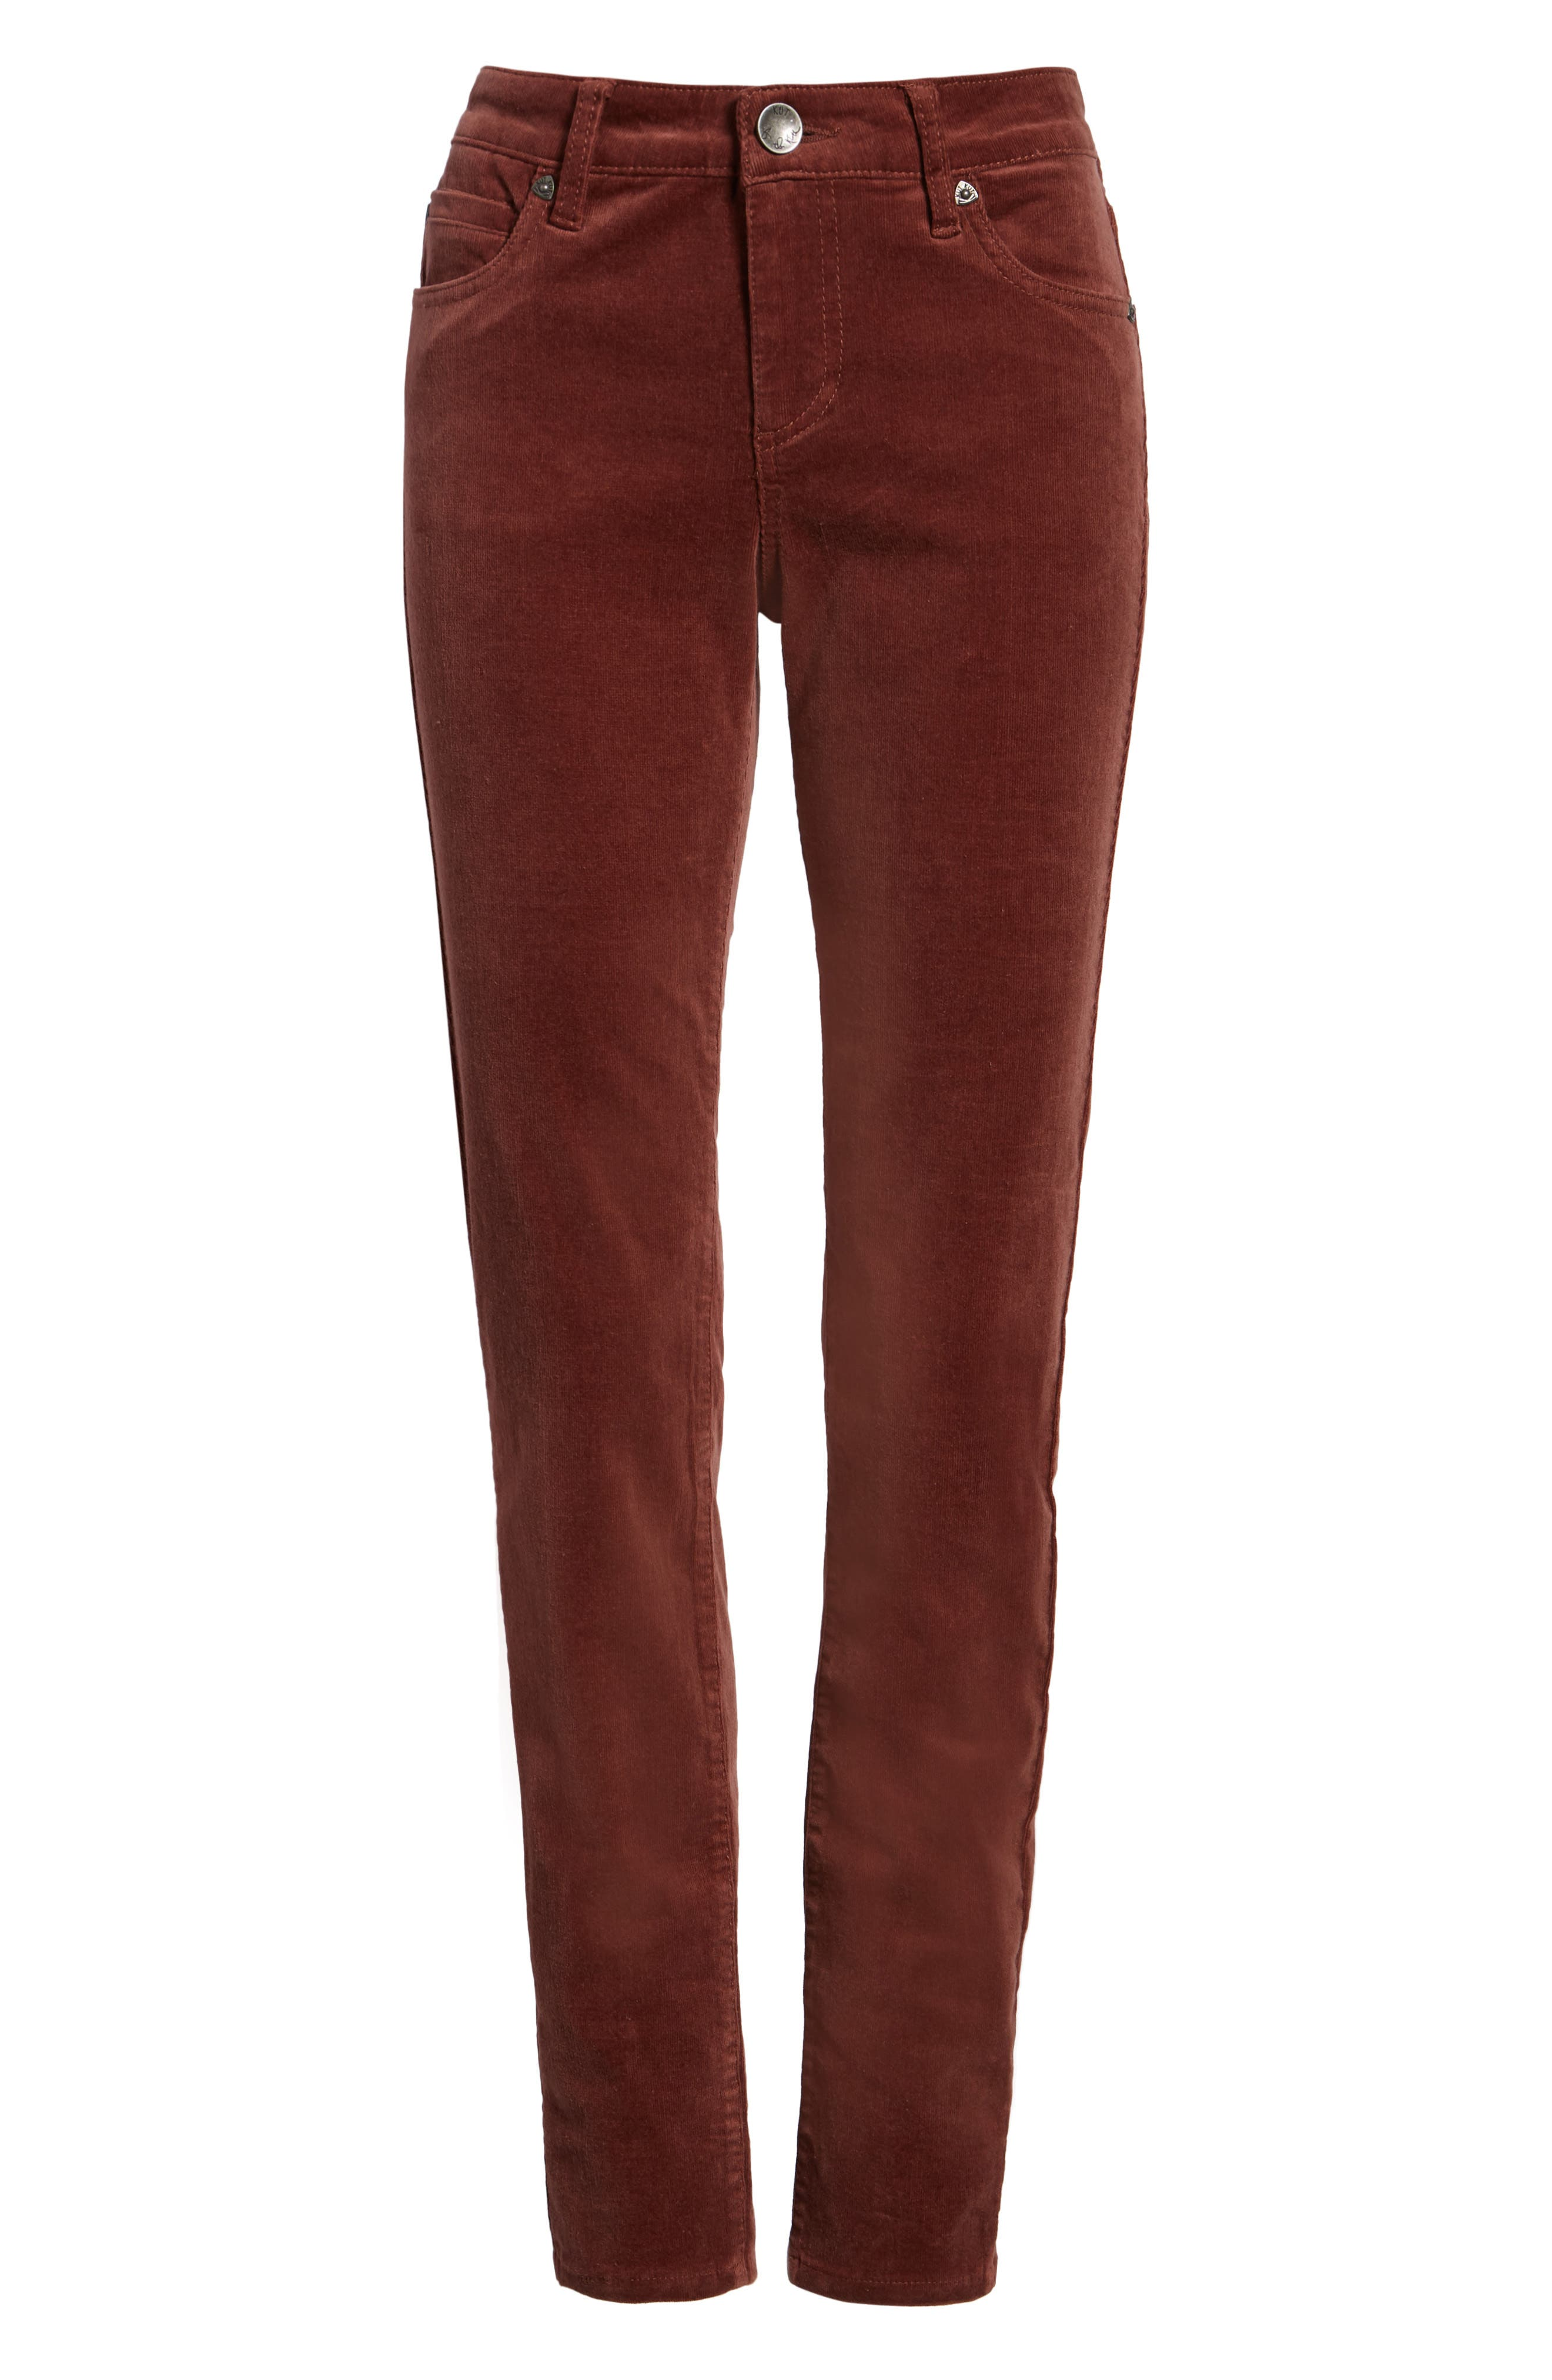 'Diana' Stretch Corduroy Skinny Pants,                             Alternate thumbnail 267, color,